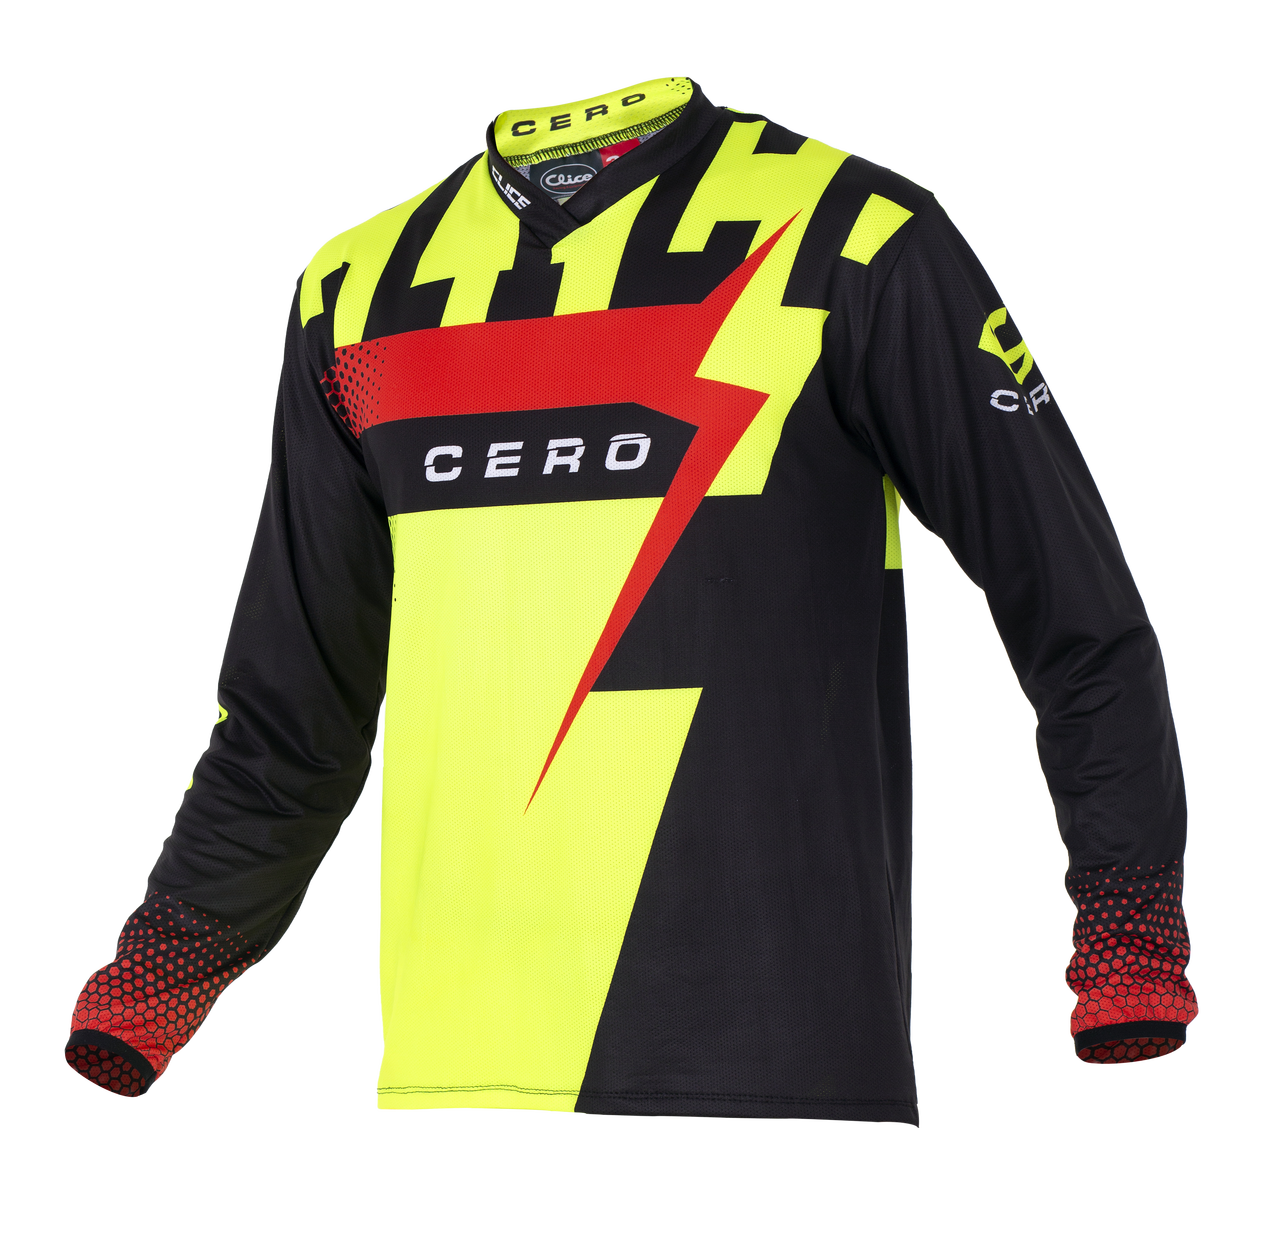 2019 Clice Cero Trial Jersey Men, Black/fluor